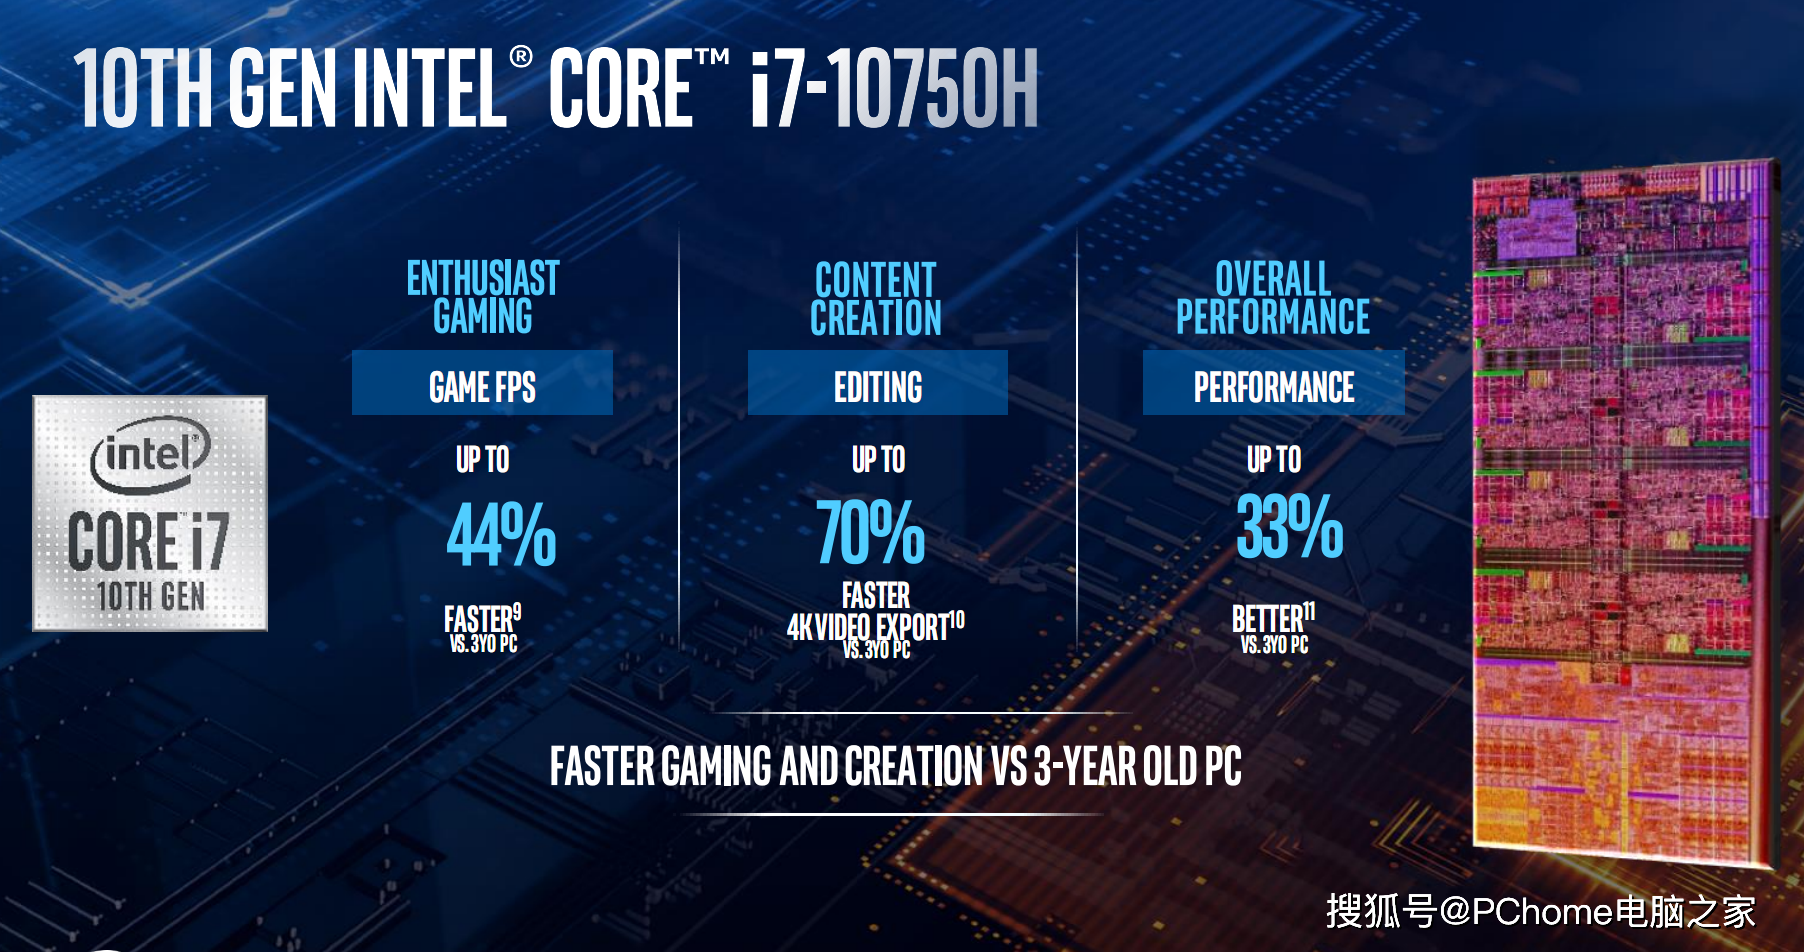 Intel官宣移动高性能版十代酷睿 最高频率5.3GHz